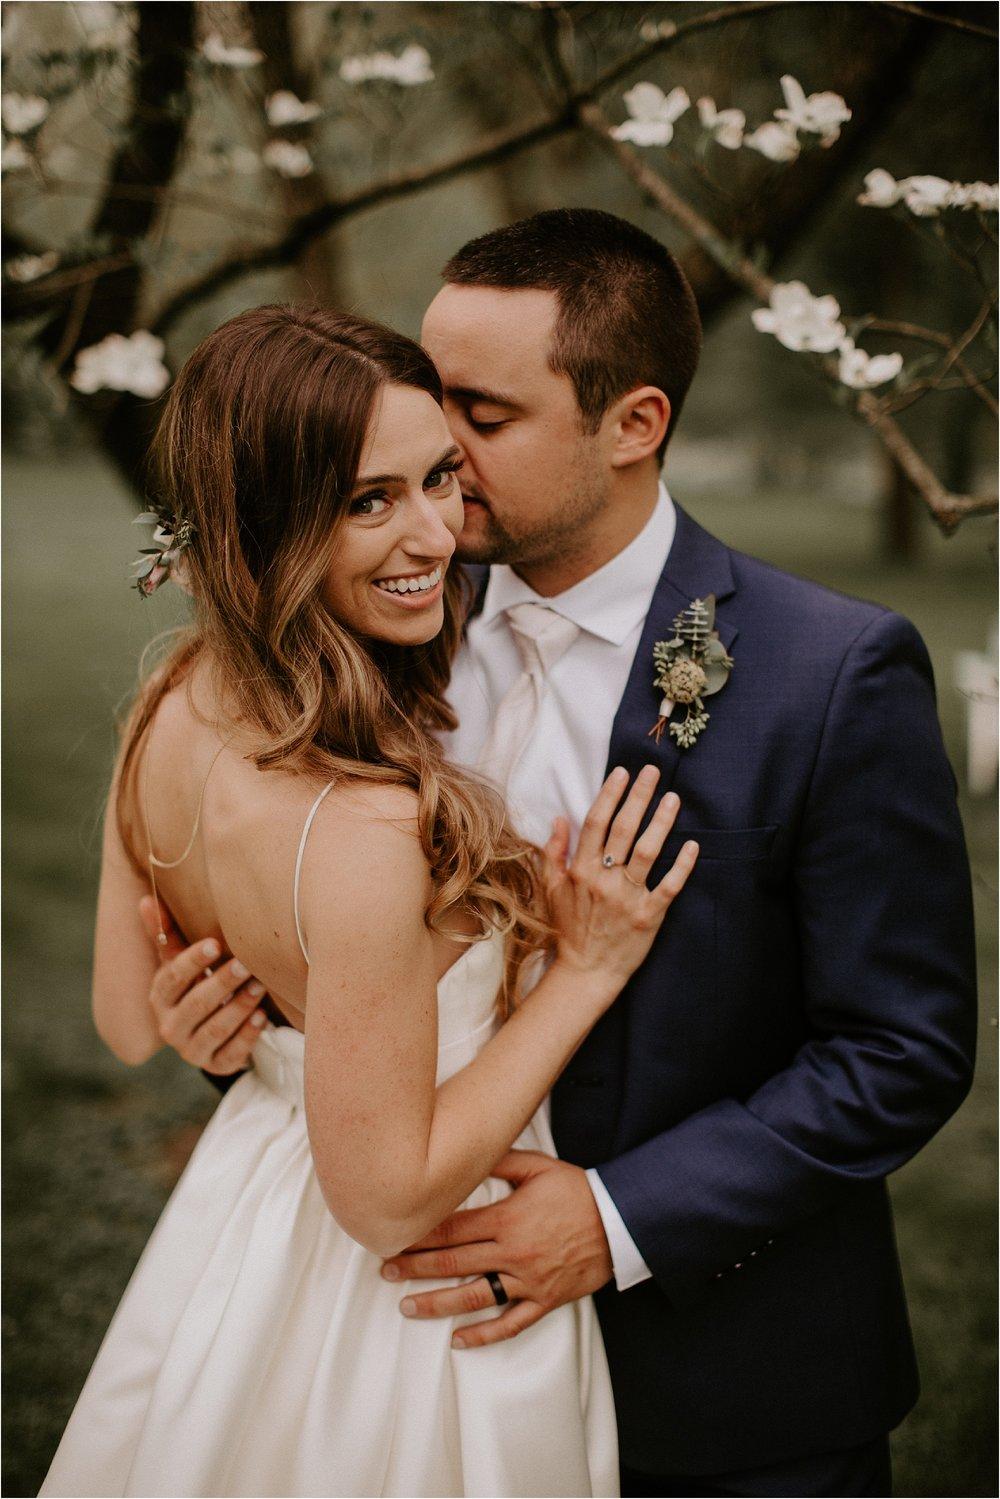 Sarah_Brookhart_Lancaster_PA_Wedding_Photographer_0036.jpg